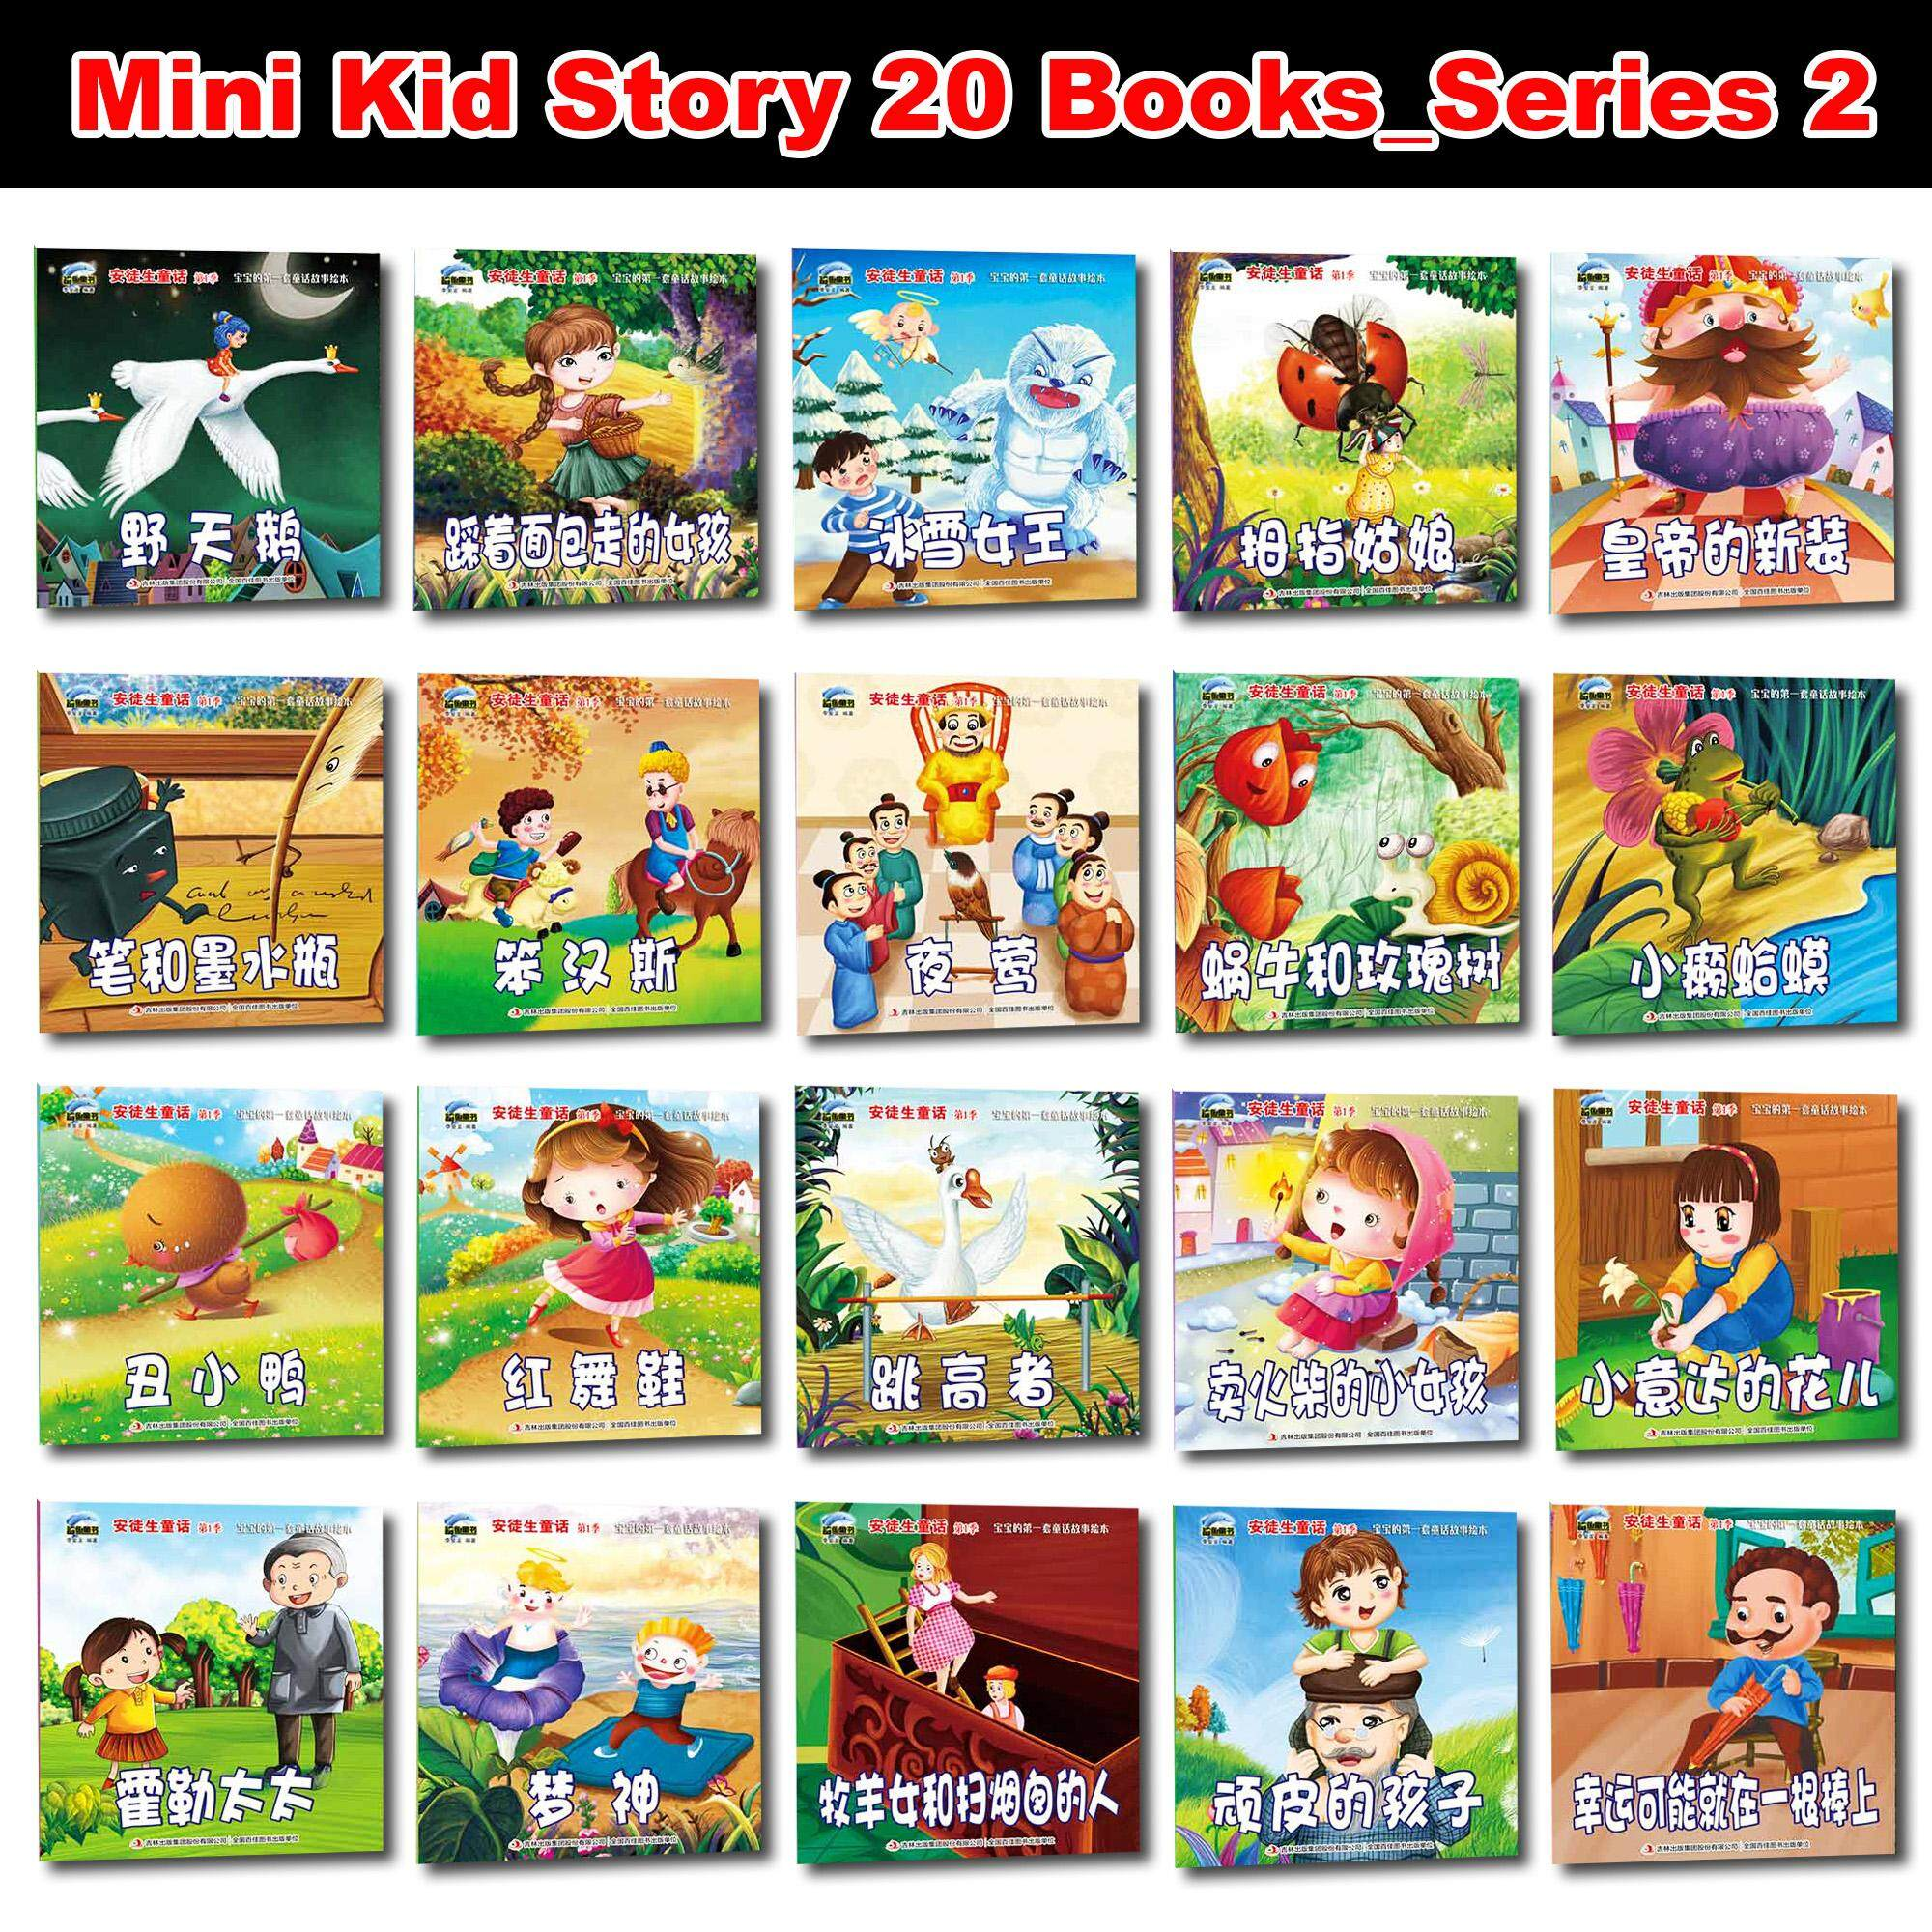 Mini Kids Story 20 Books_Series 2